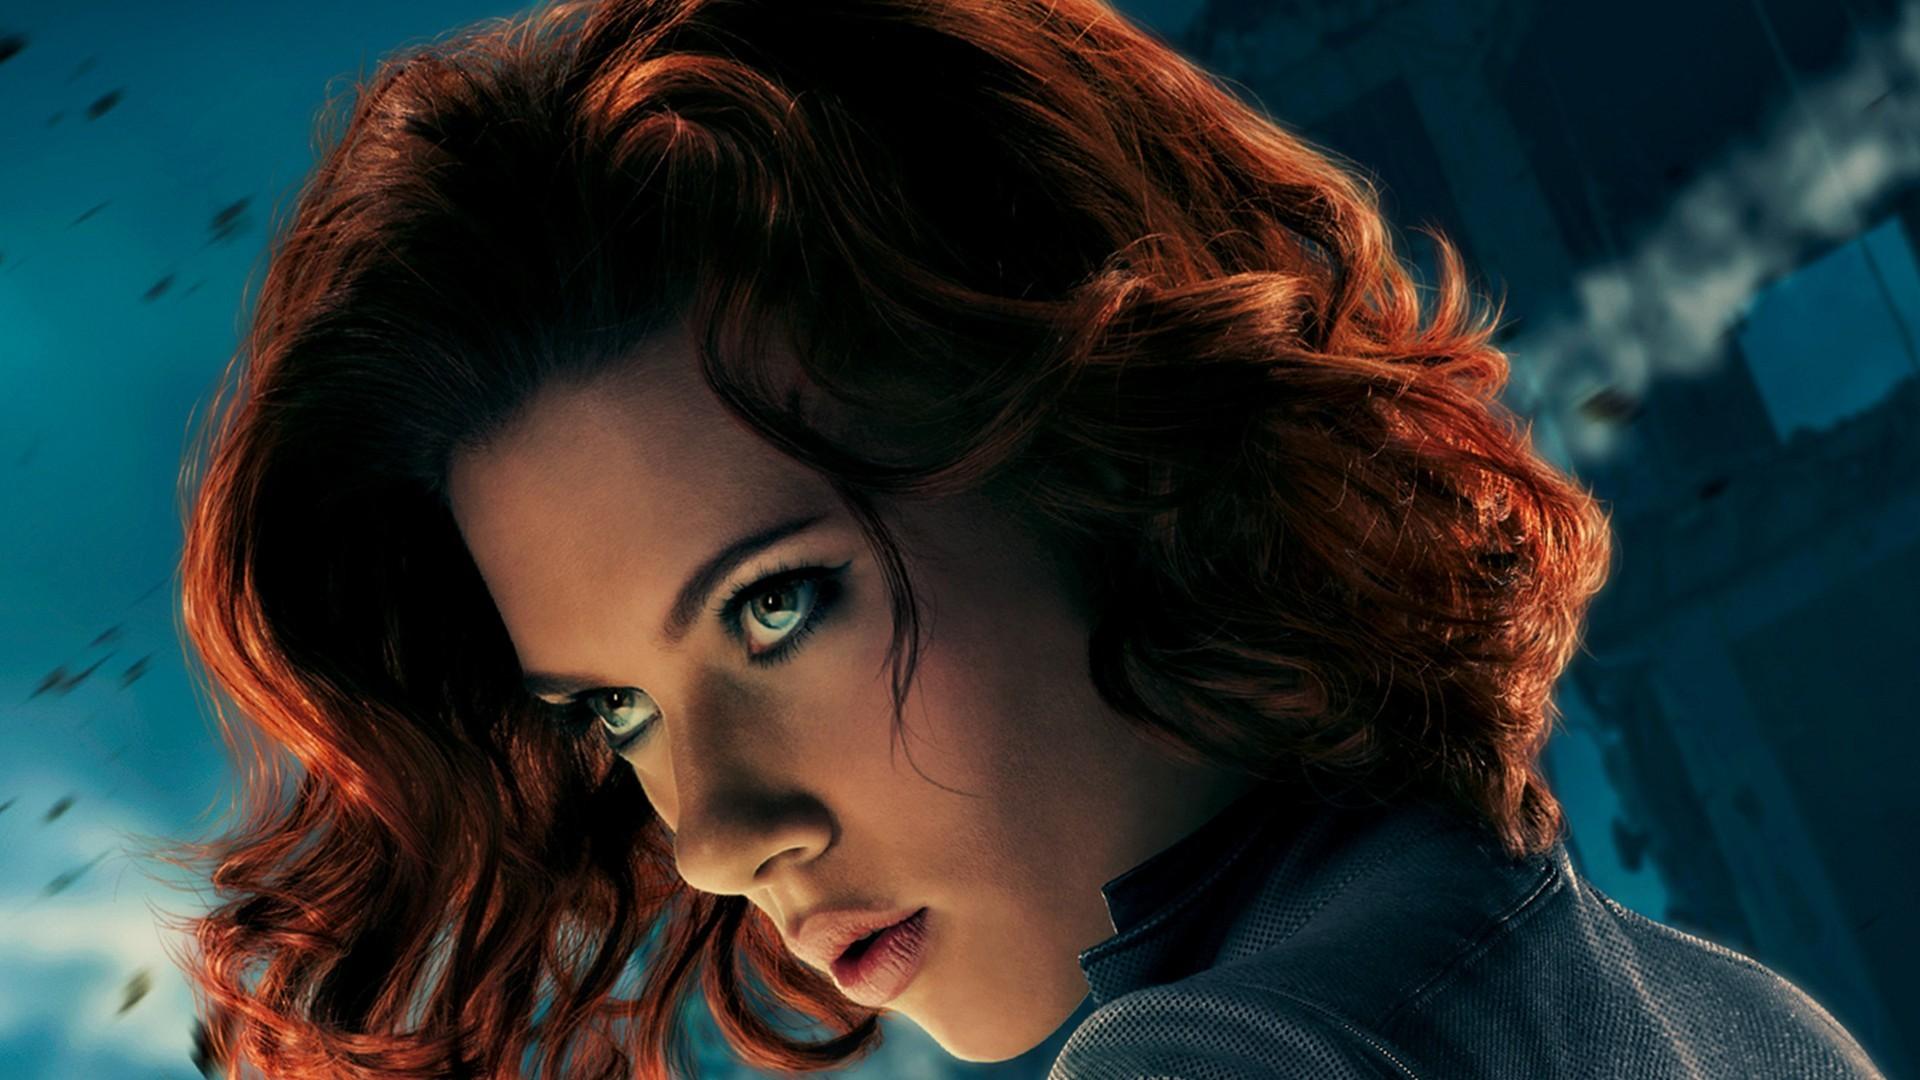 1404x2048 Black Widow Avengers Age Of Ultron A Scarlett Johansson HD Newest Wallpapers